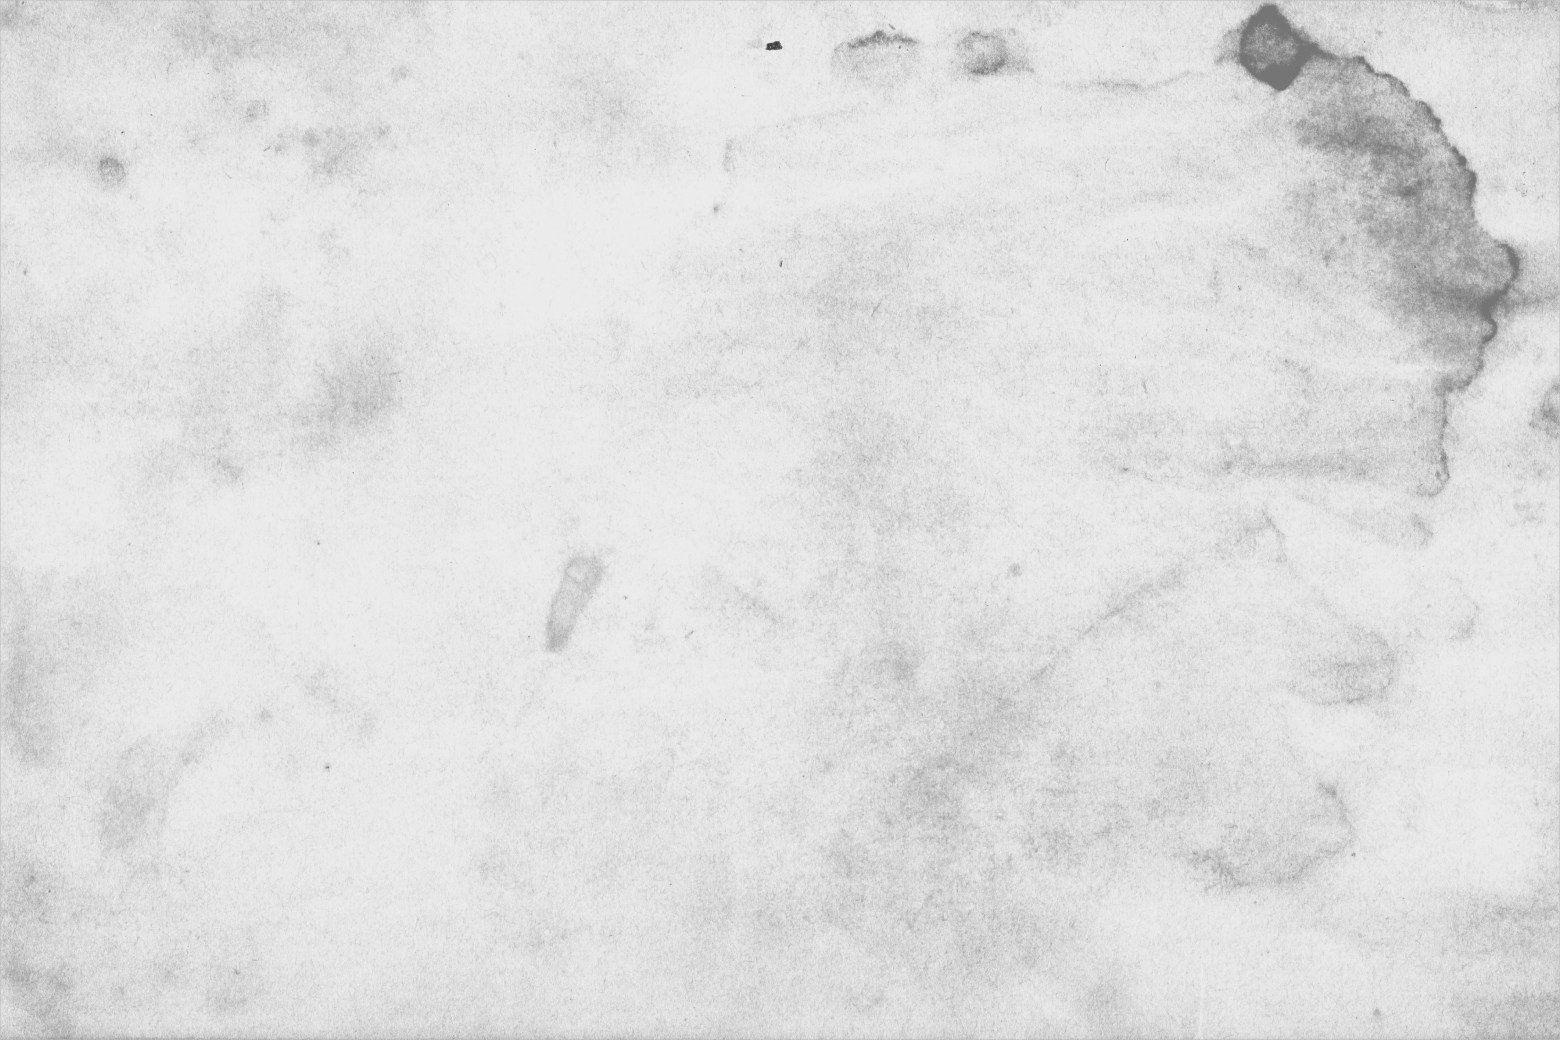 Amazing White Grunge Texture The new white grunge textures